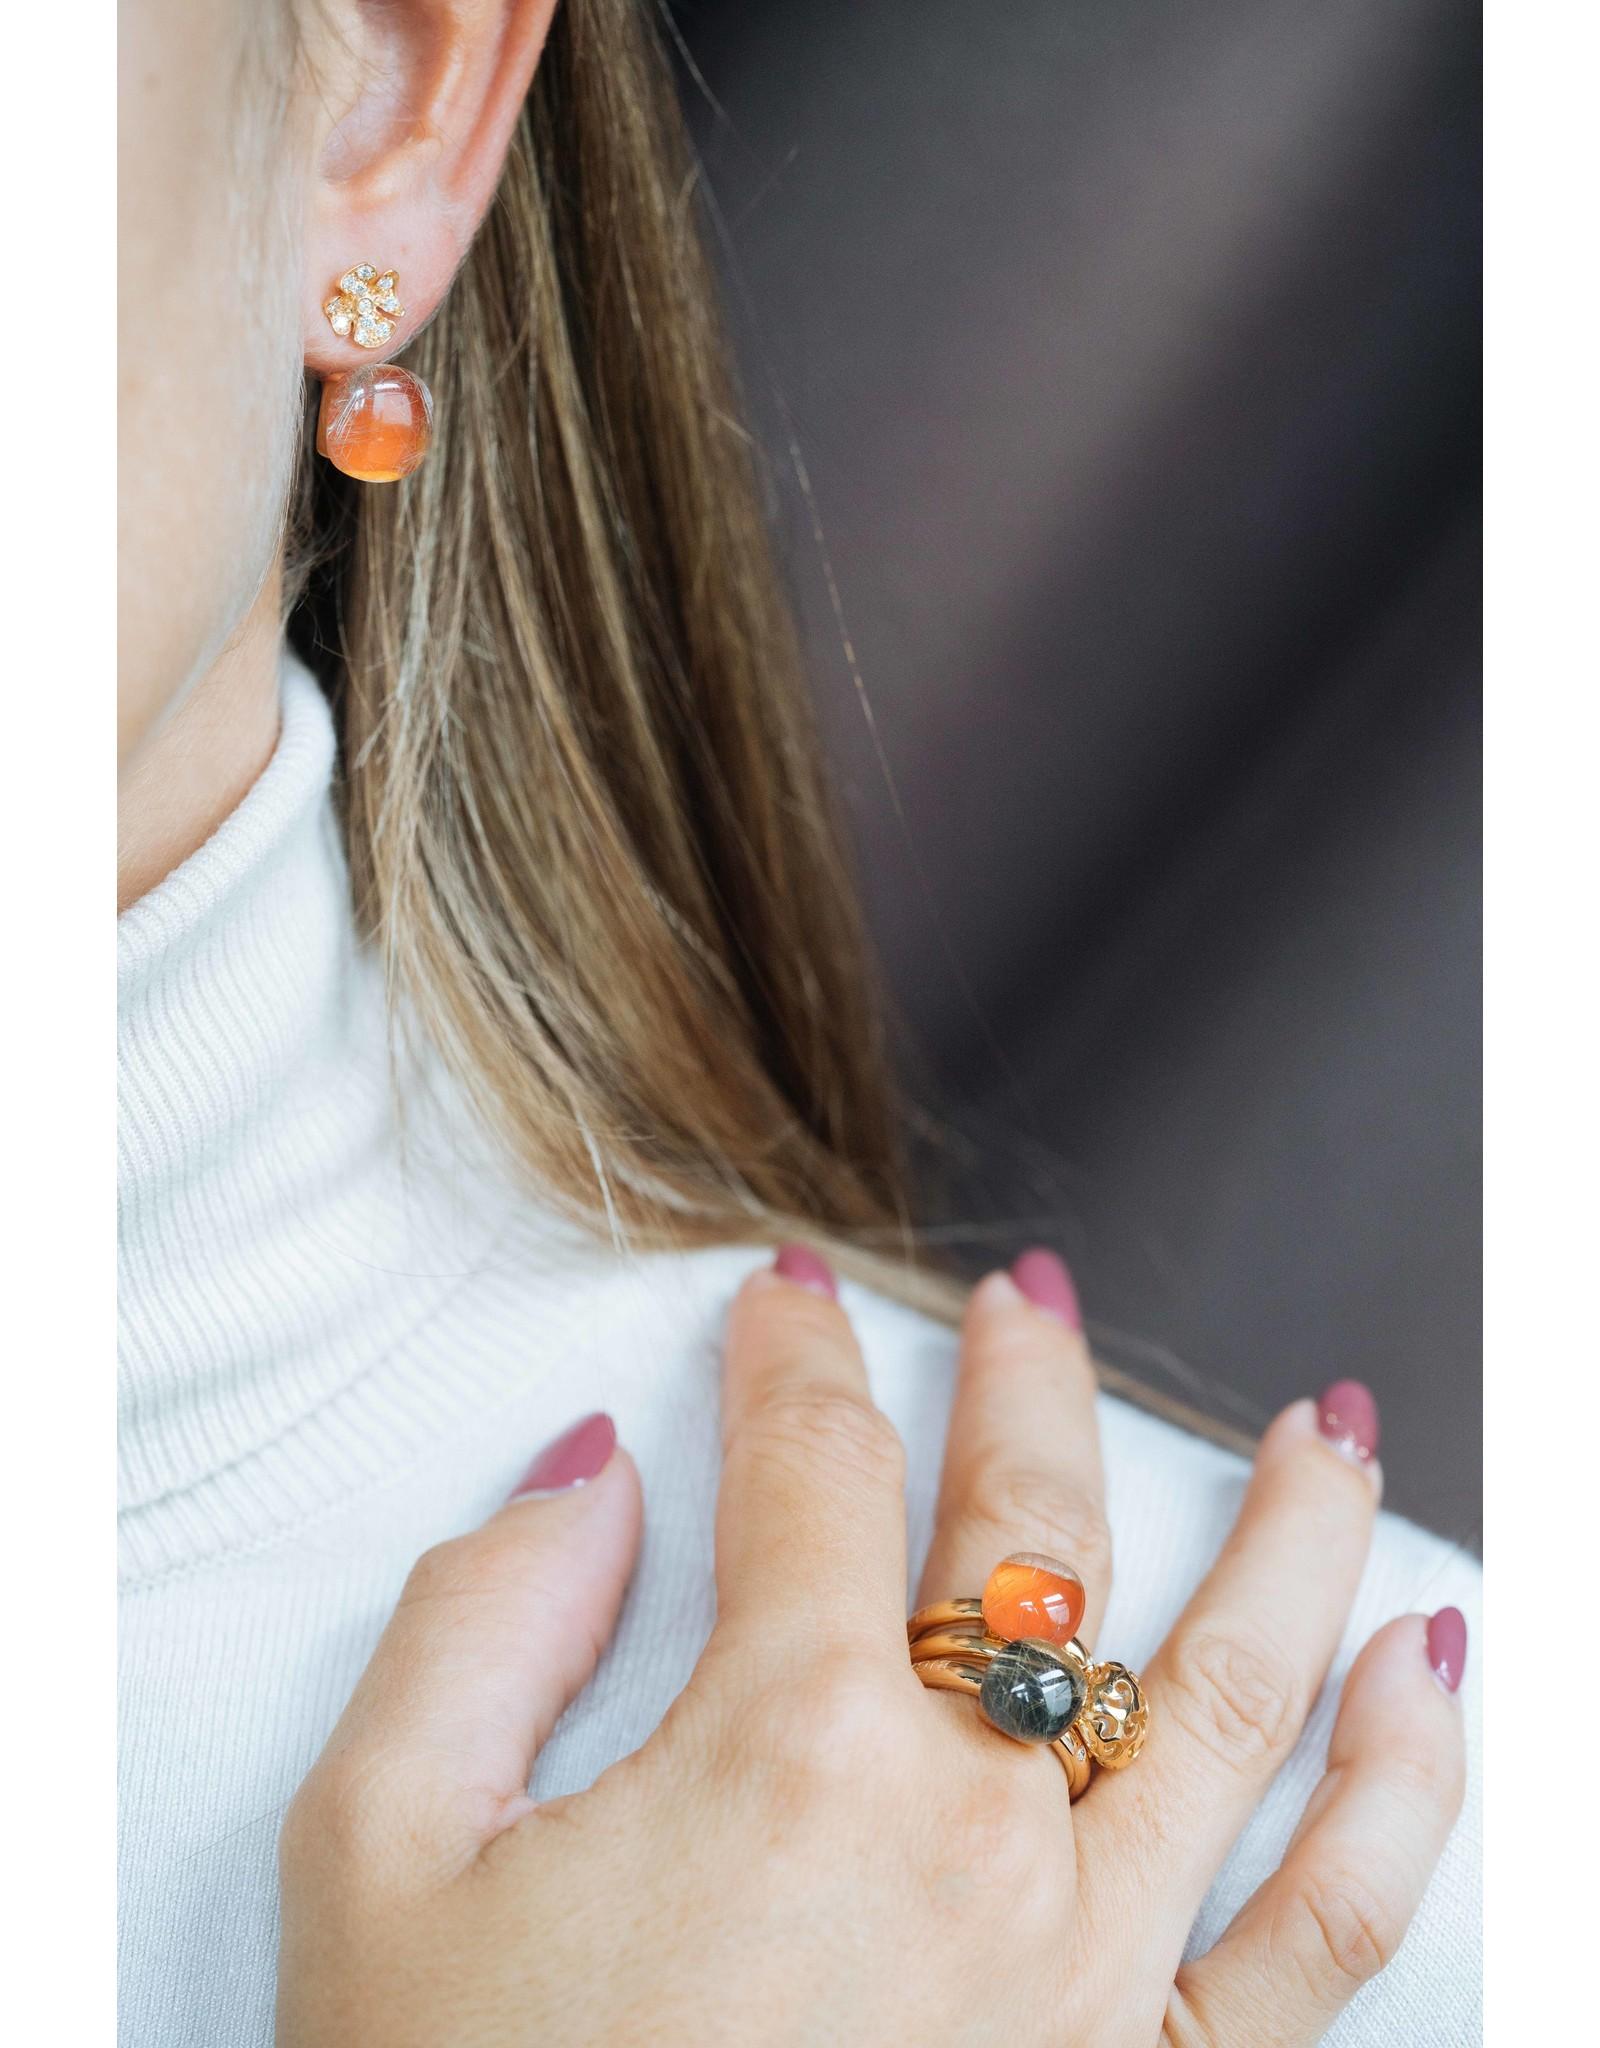 Bigli Oorringen Mini Sweety agaat oranje & rutielkwarts